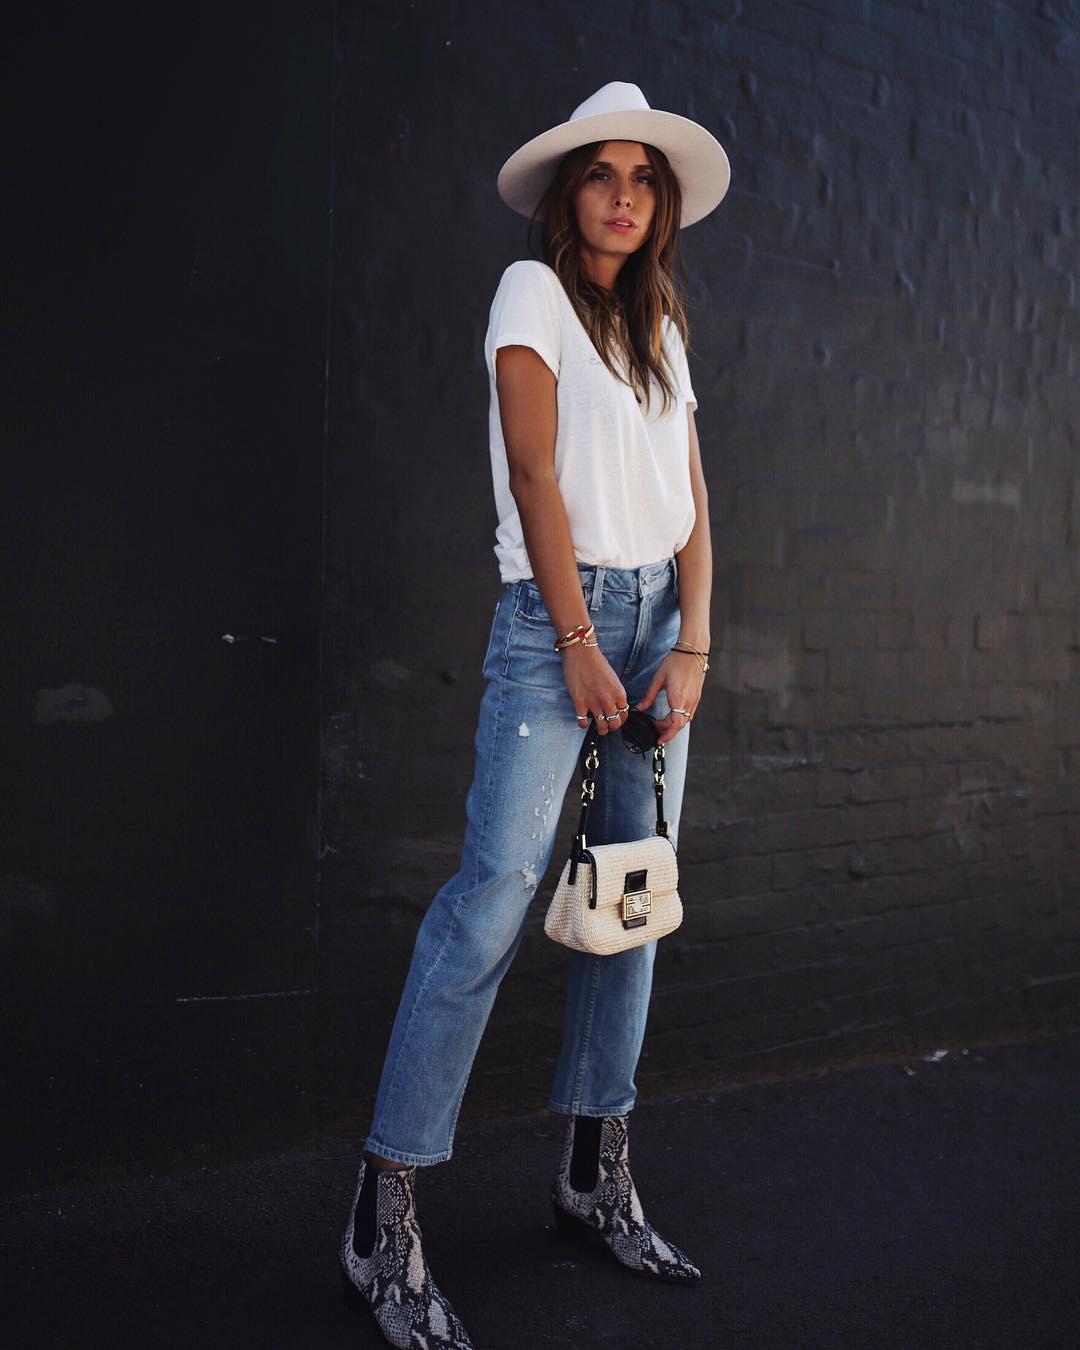 джинсы и футболка фото 5